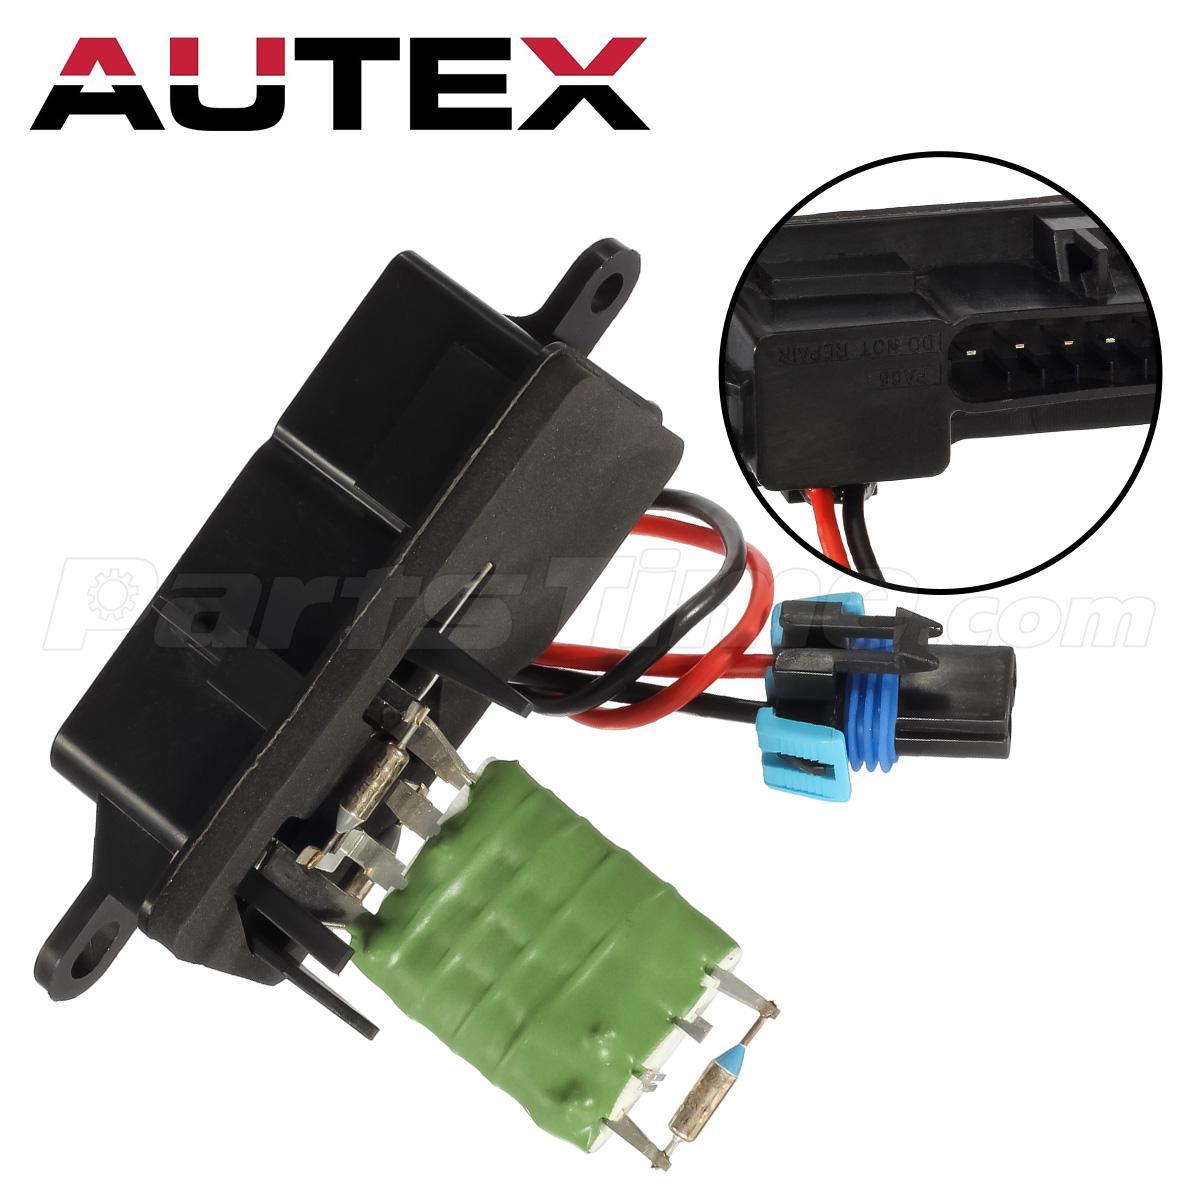 Heater blower motor resistor not working 28 images for Heater blower motor not working